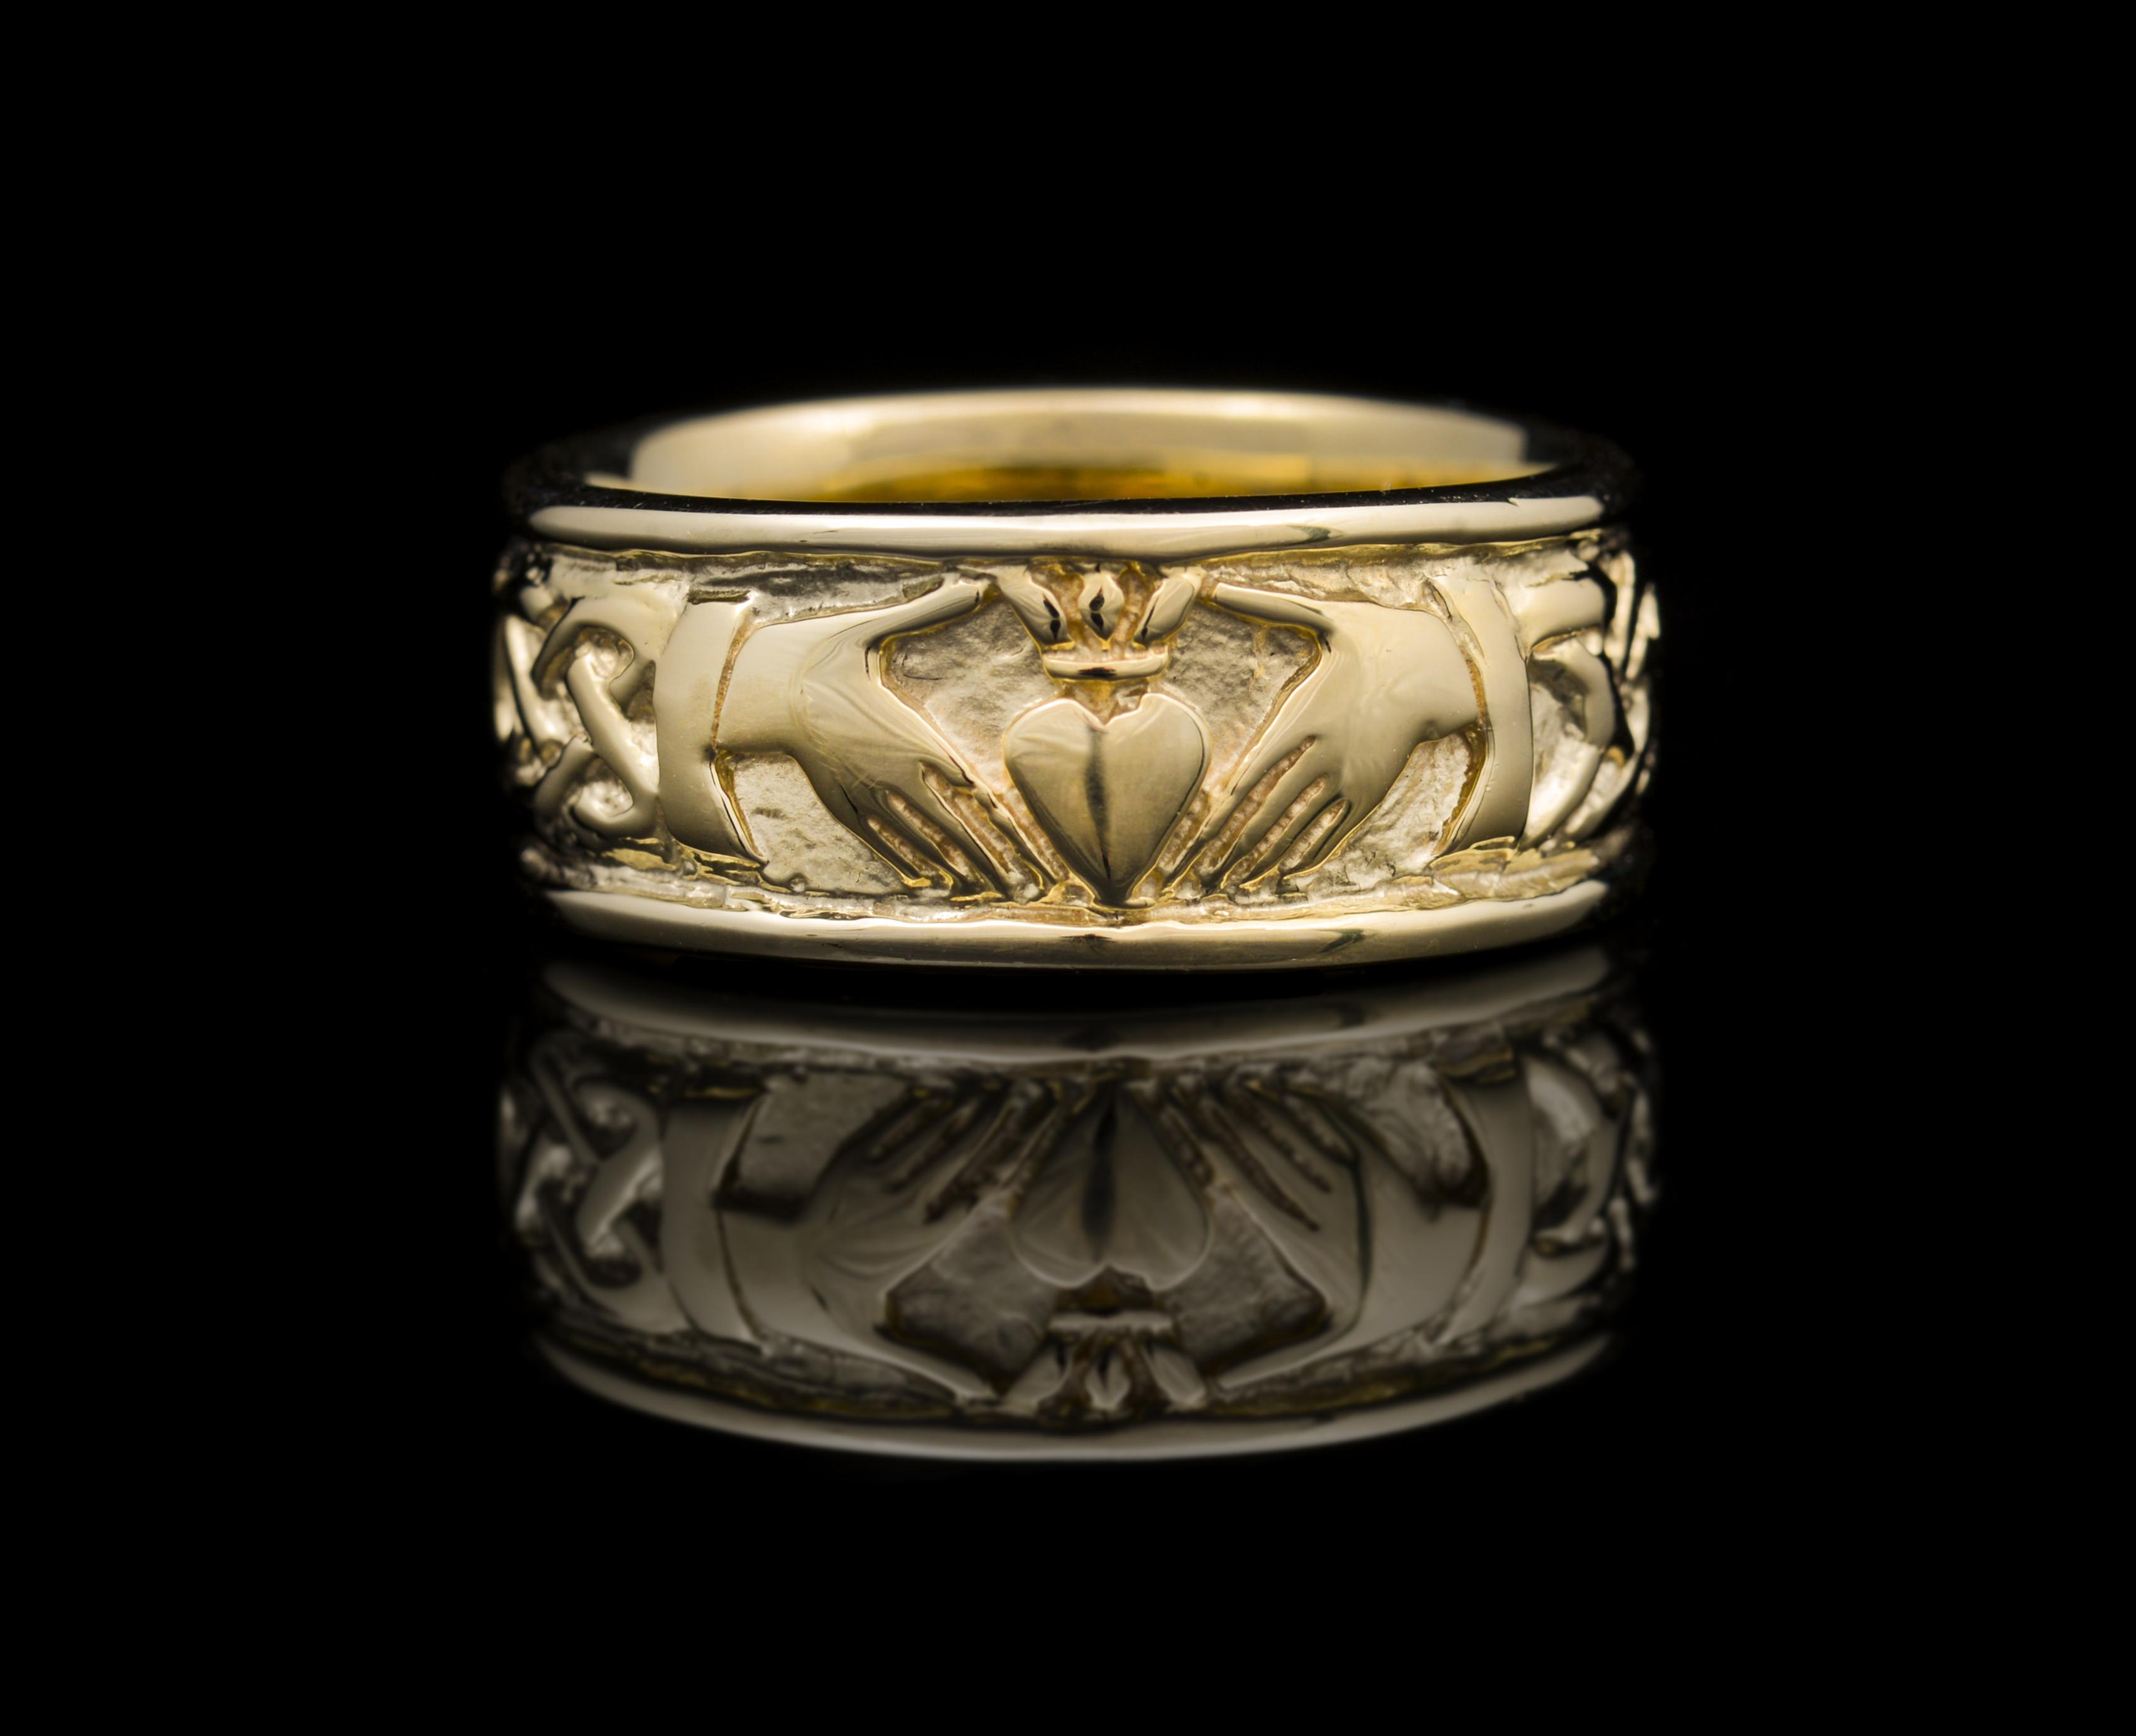 14kt Gold 12mm St Michaels Claddagh Wedding Band